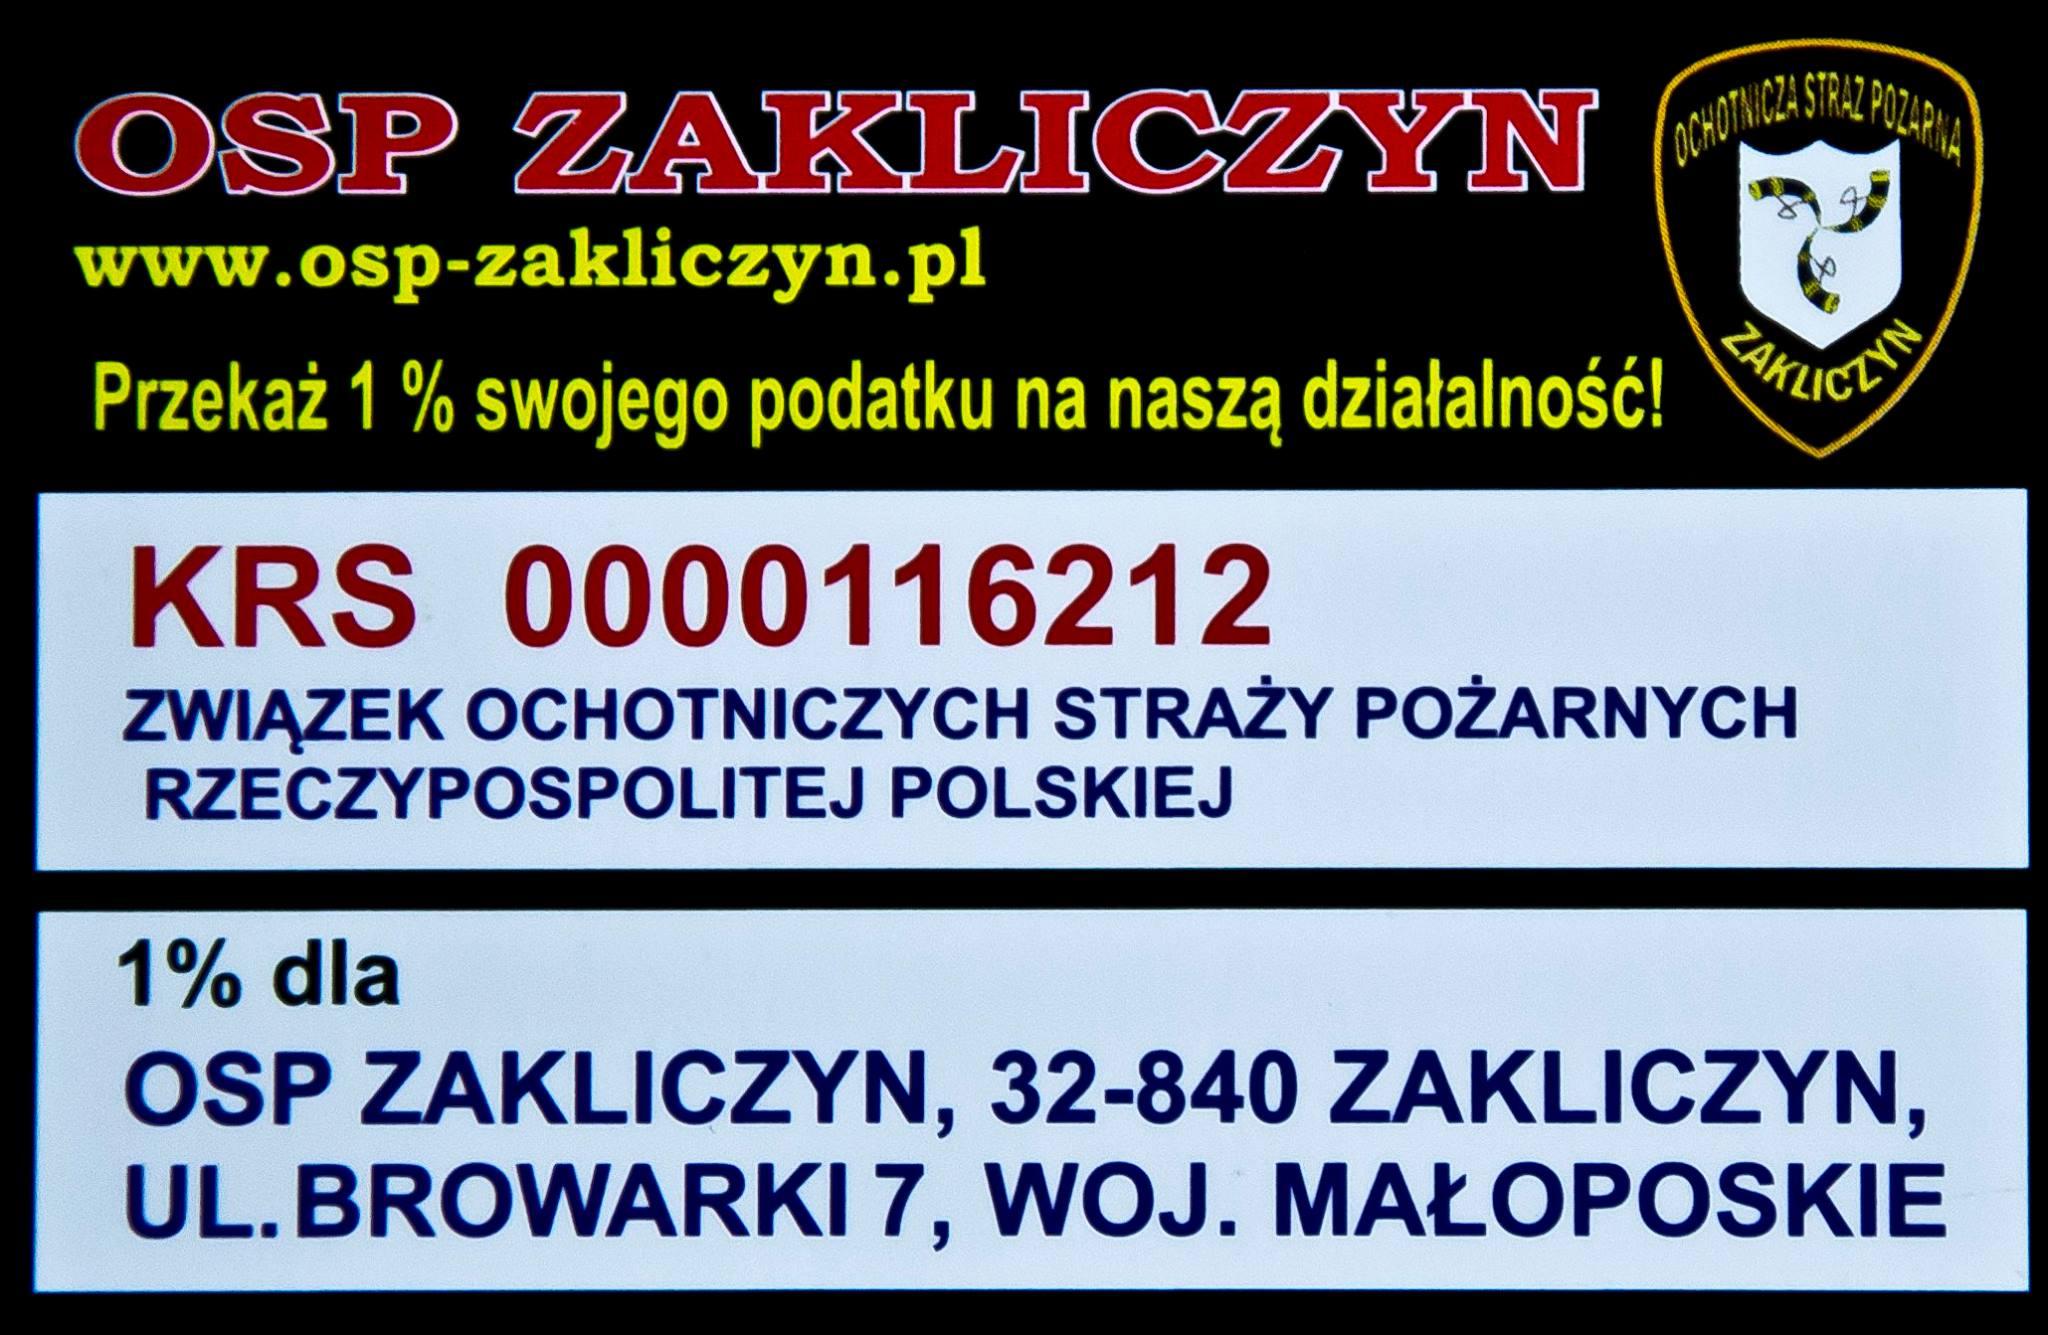 12513876_1298197730206096_366597578996218700_o